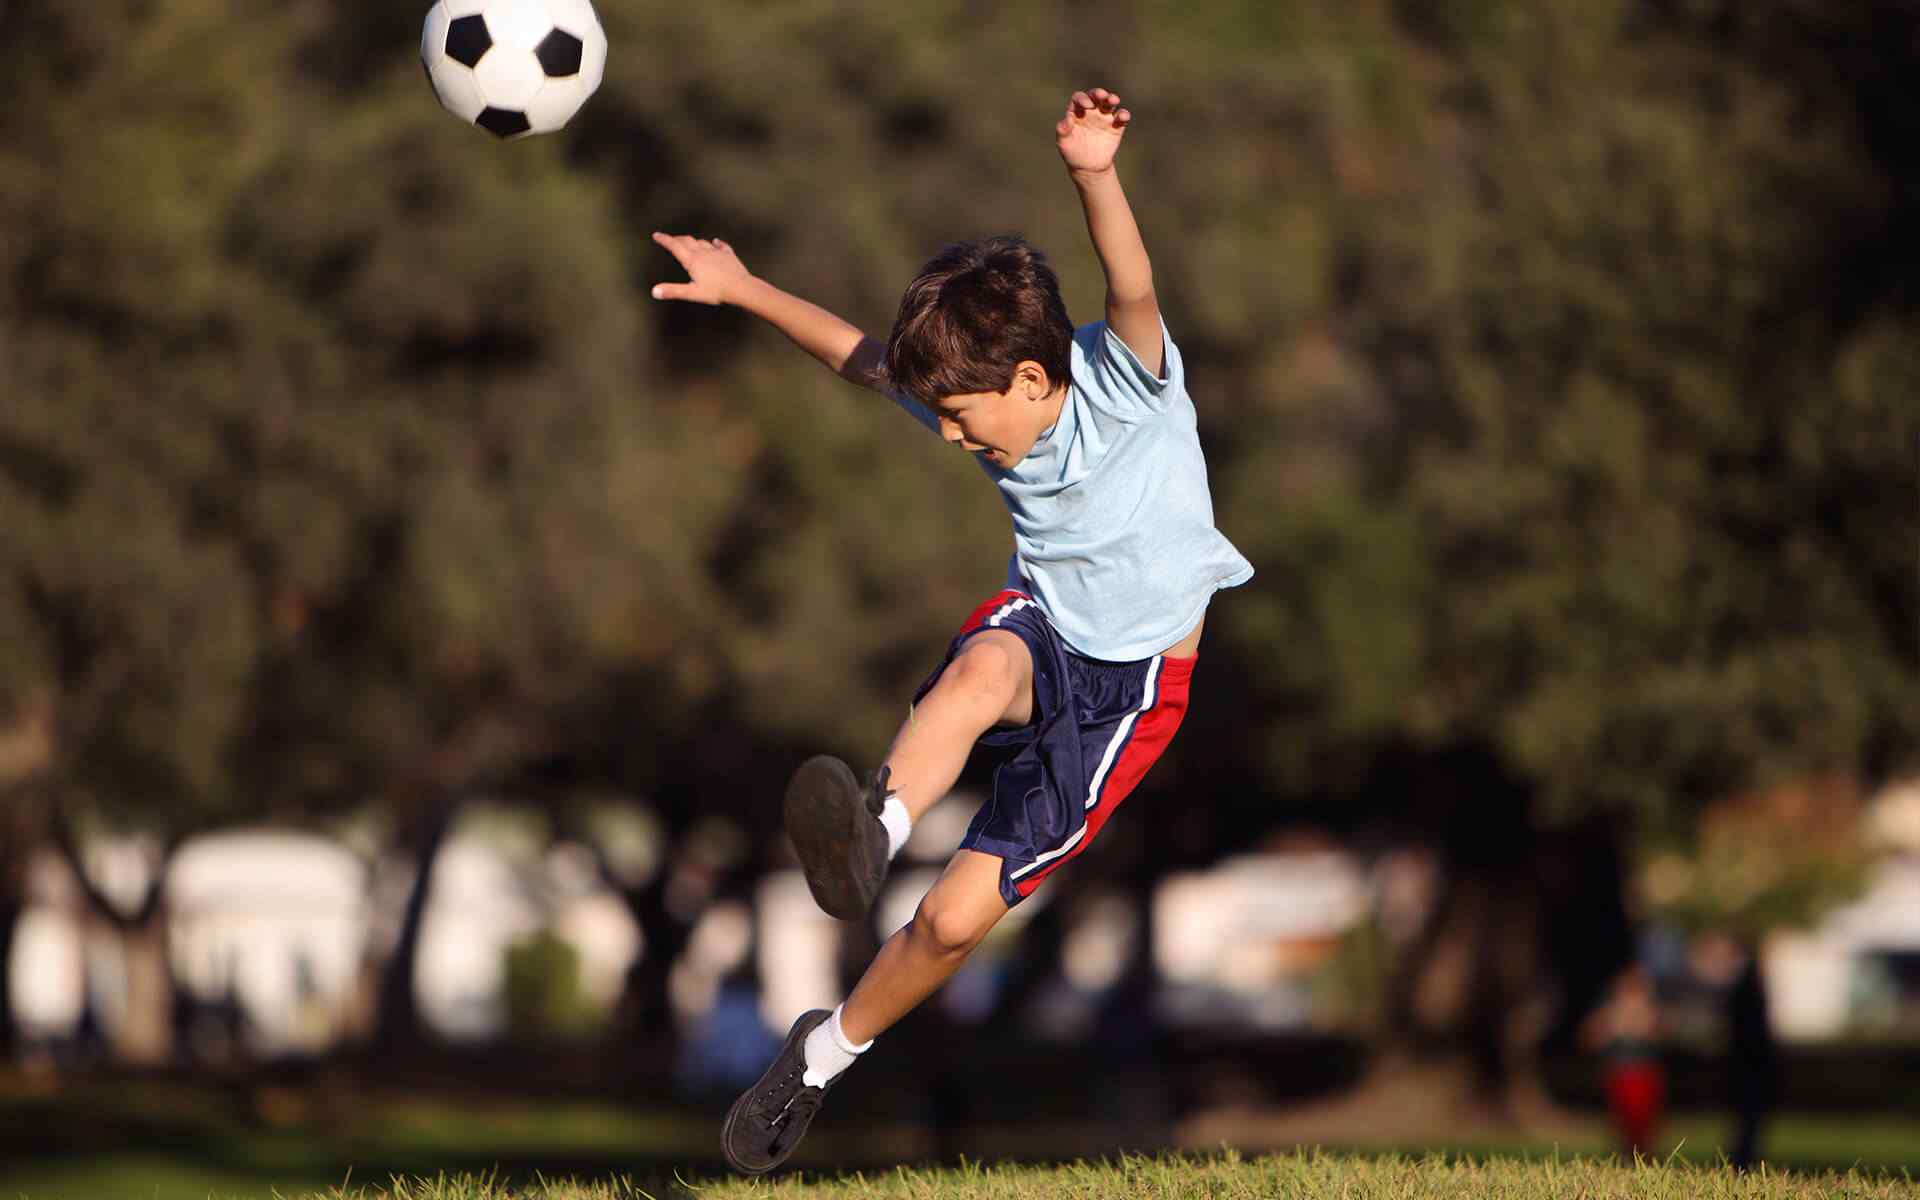 http://www.sportingpicentia.com/wp-content/uploads/2017/10/post_04.jpg